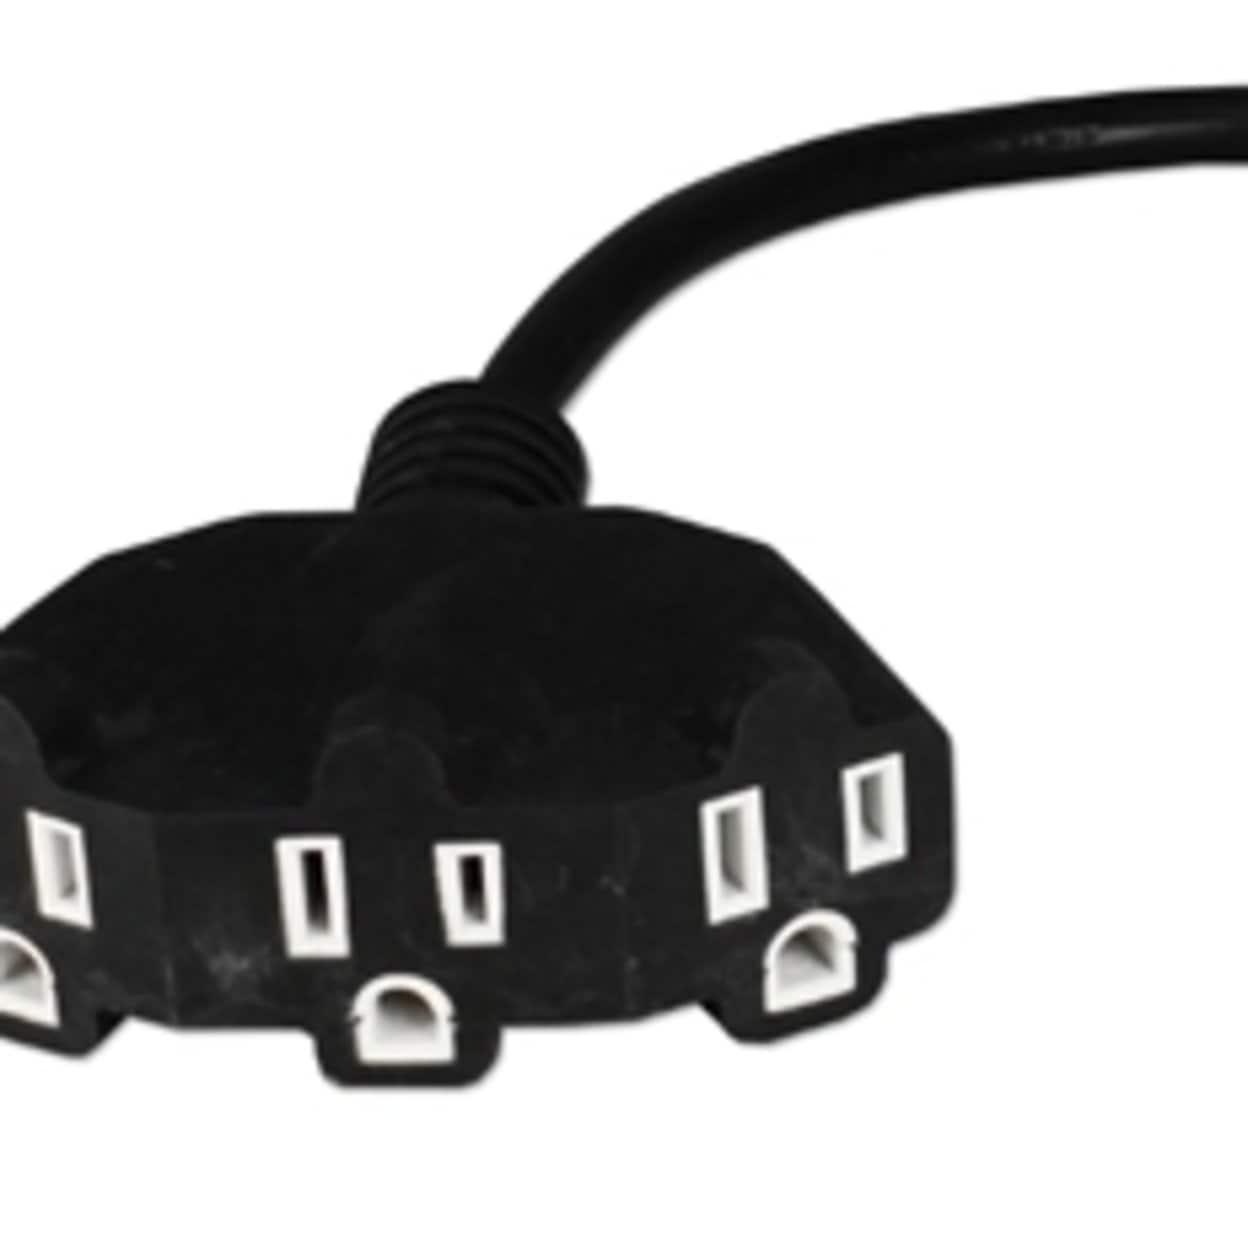 "QVS Outlet Saver 16/"" AC Power Splitter Adapter in Black"